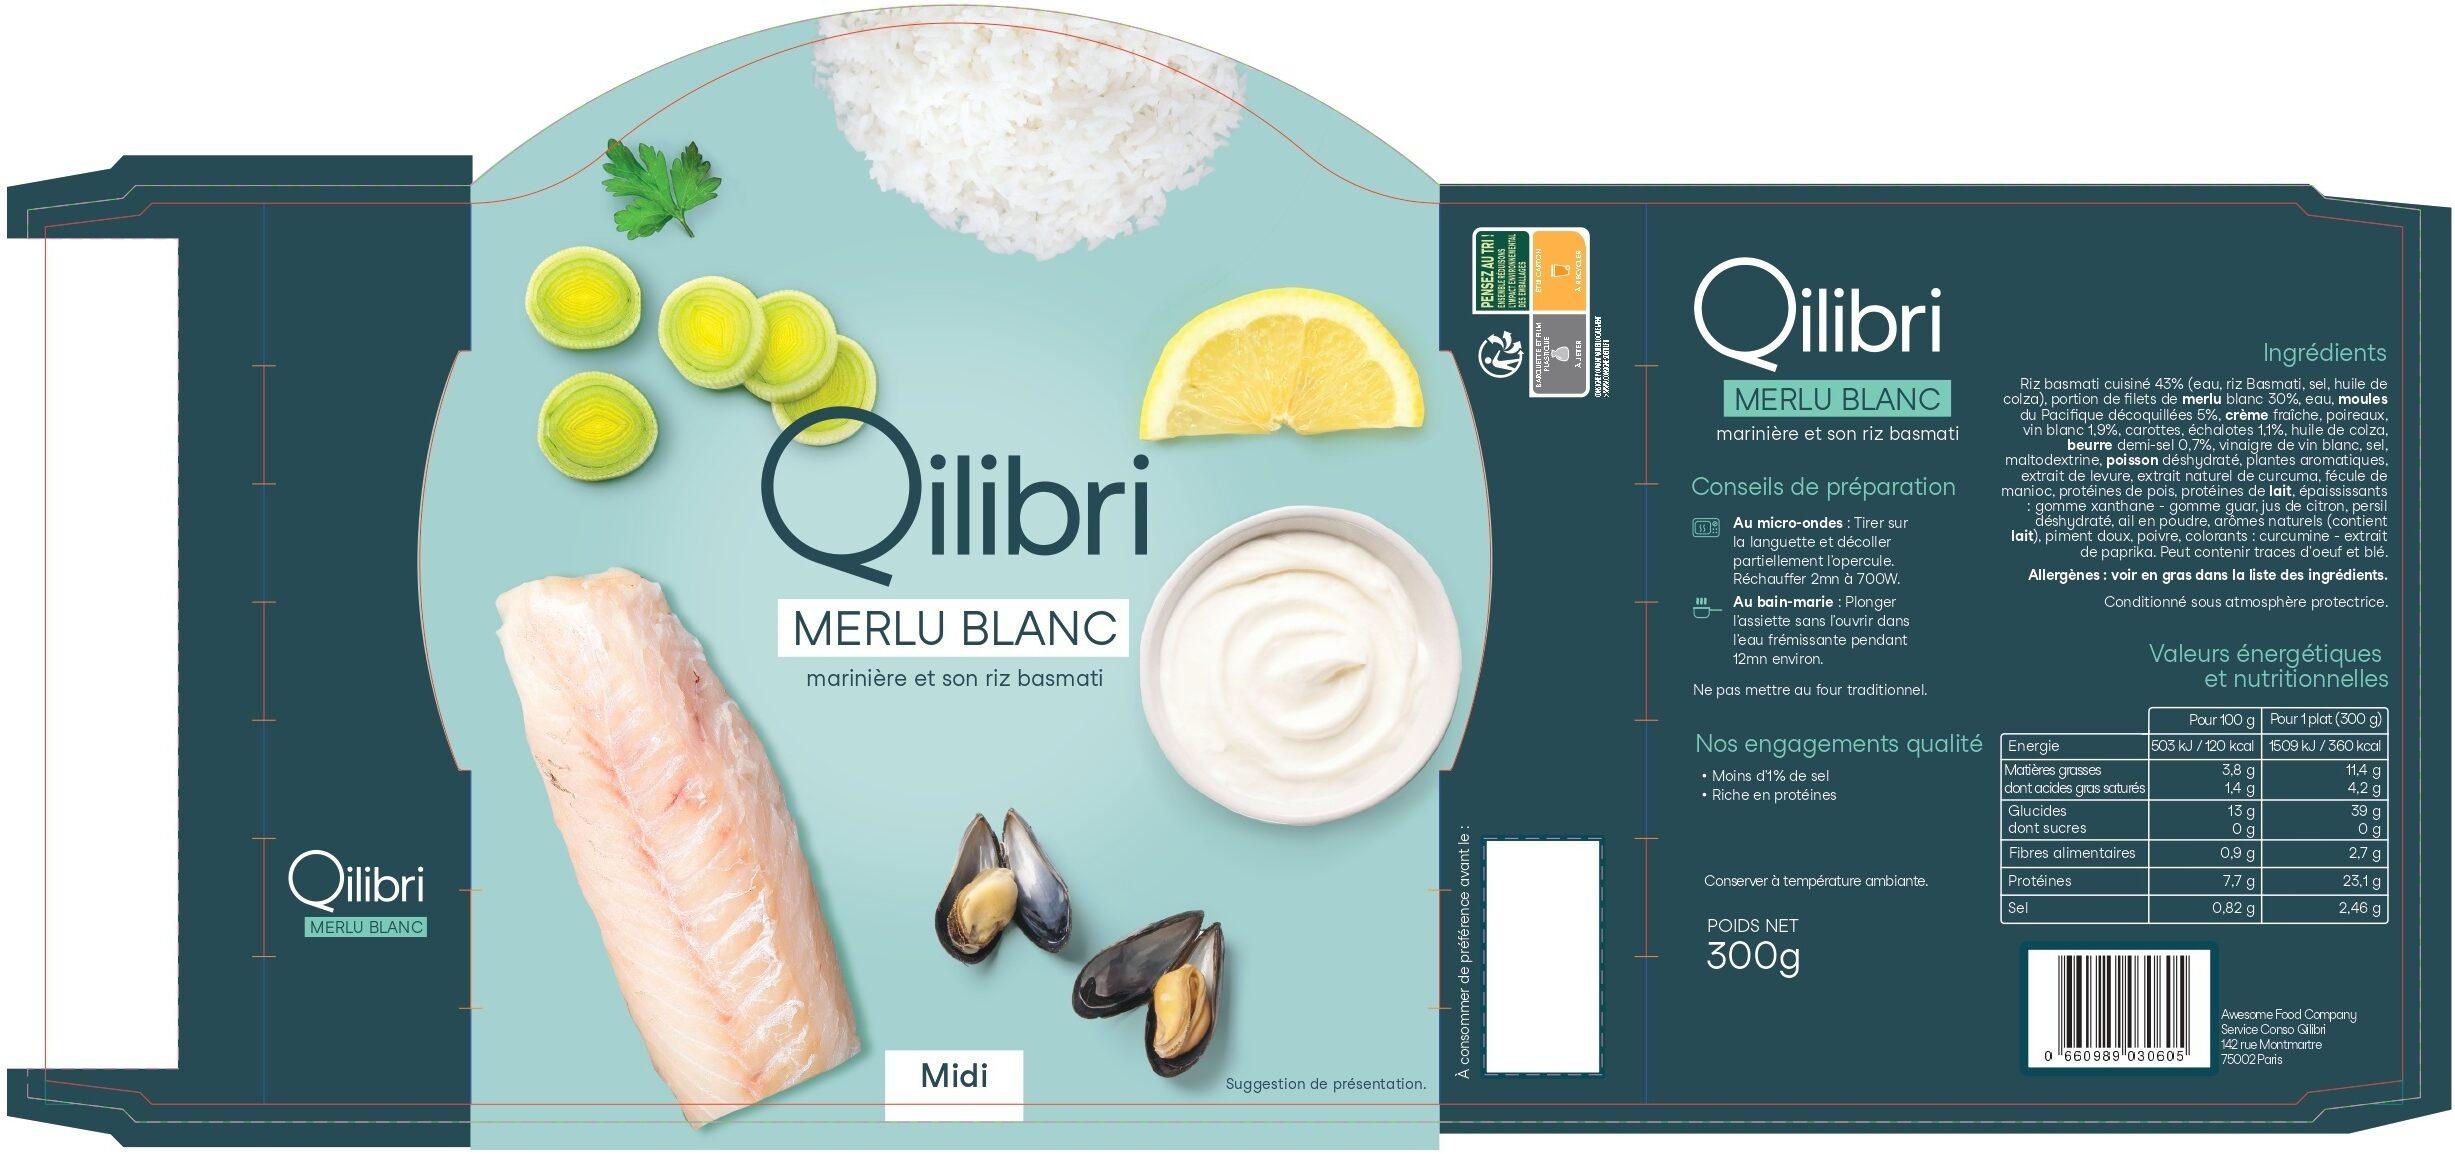 Merlu blanc marinière et son riz basmati - Produit - fr